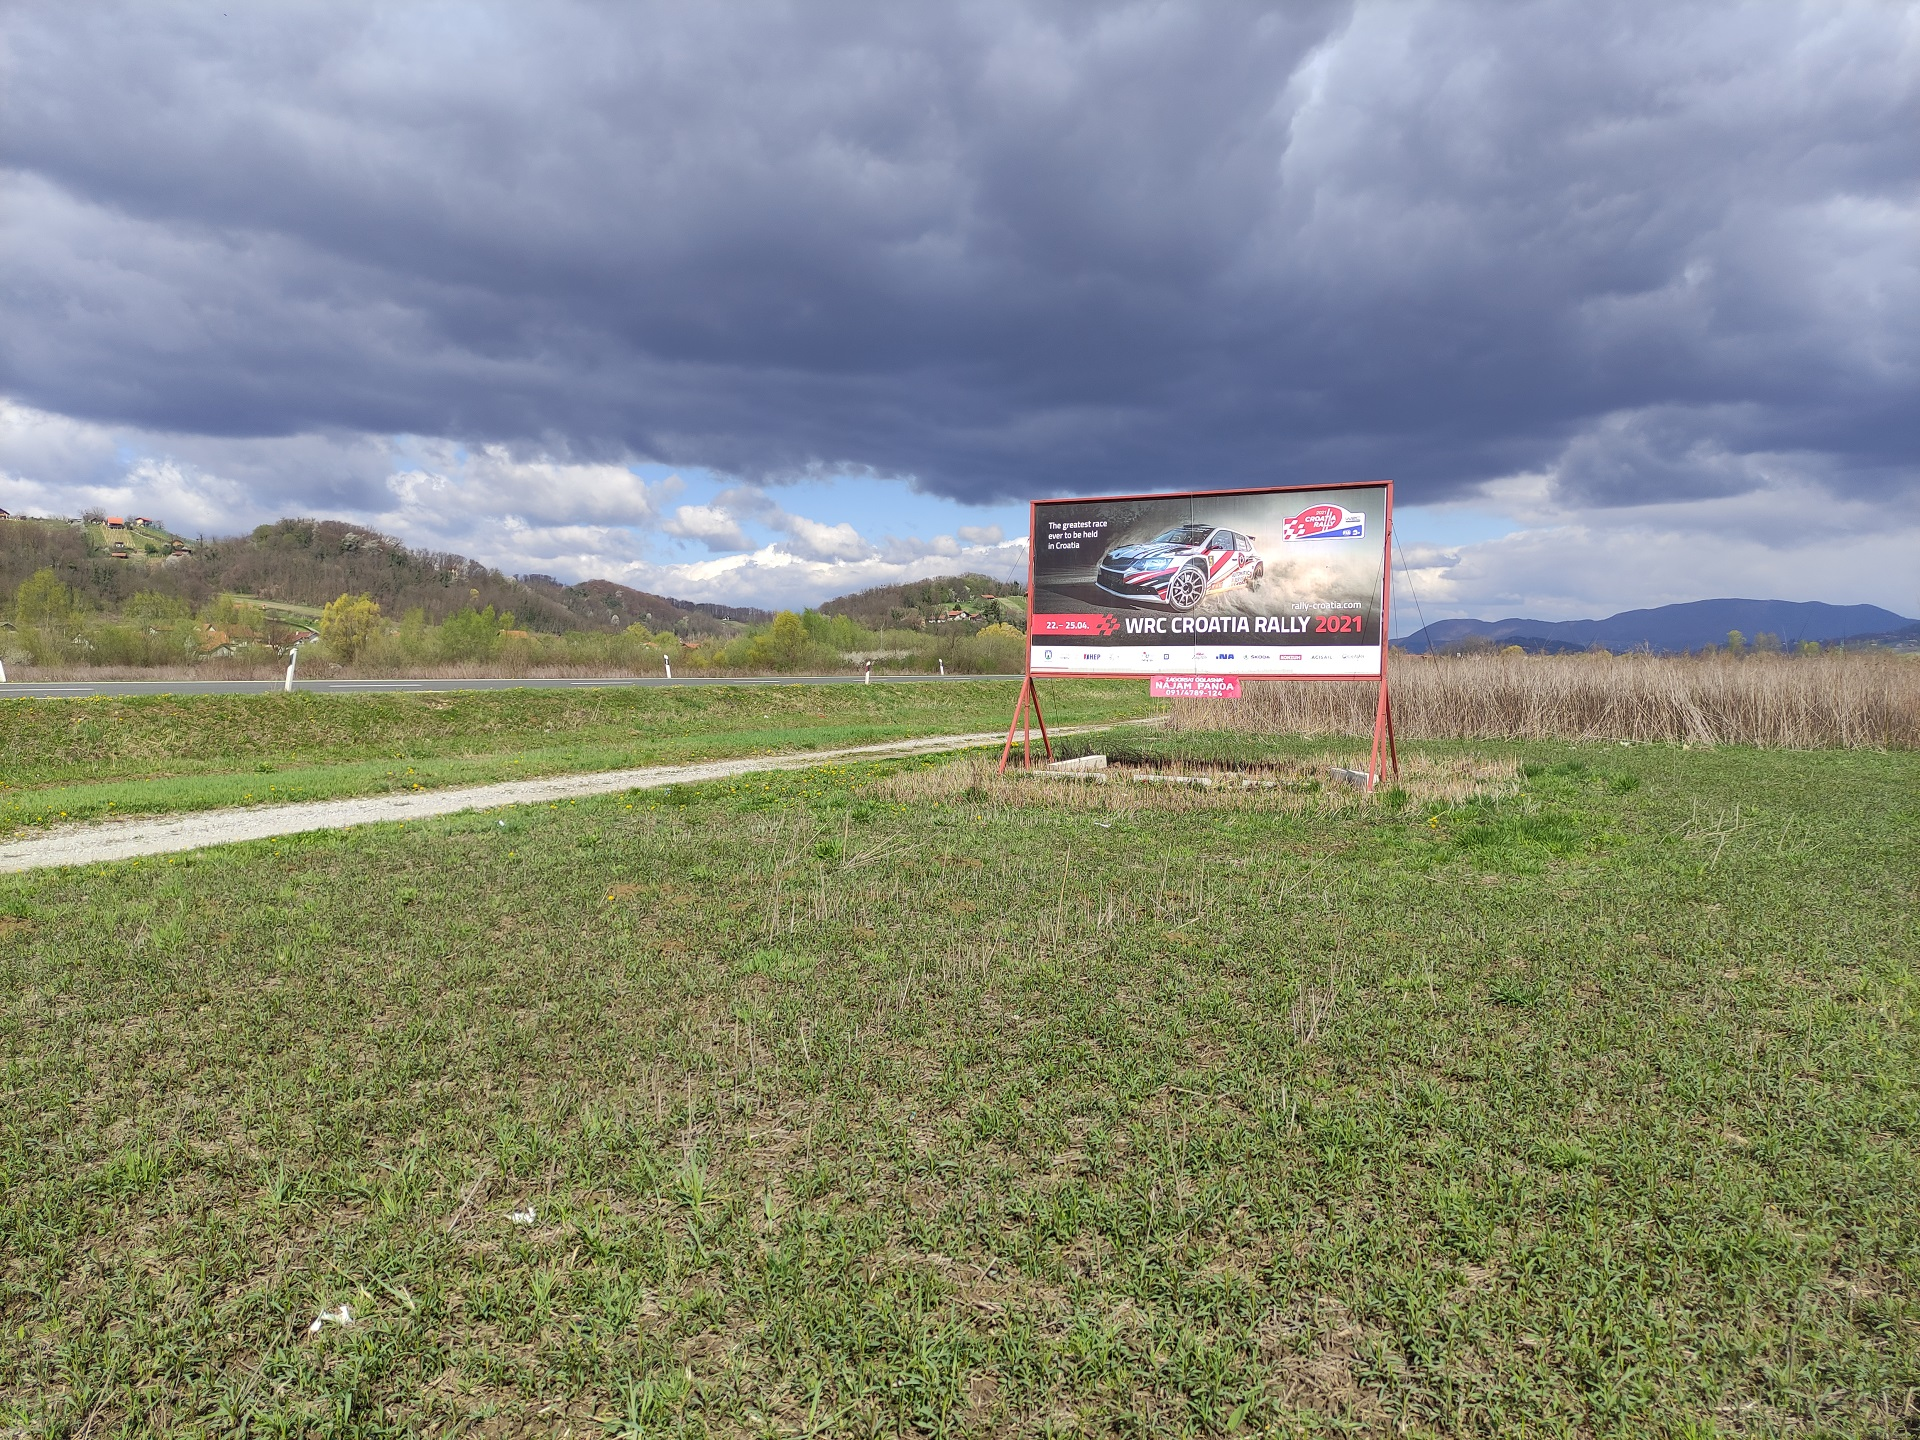 Pano brza cesta Zabok-Začretje-Krapina - WRC Croatia Rally 2021